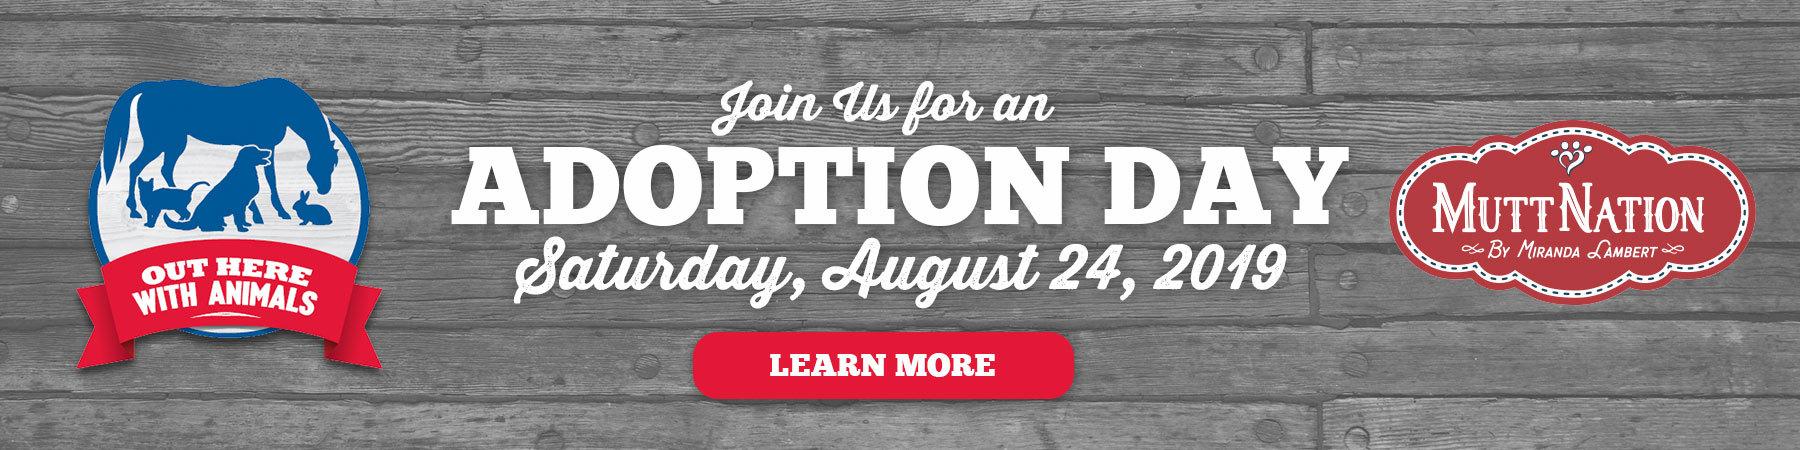 event-partners-adoption-day-19-banner.jpg